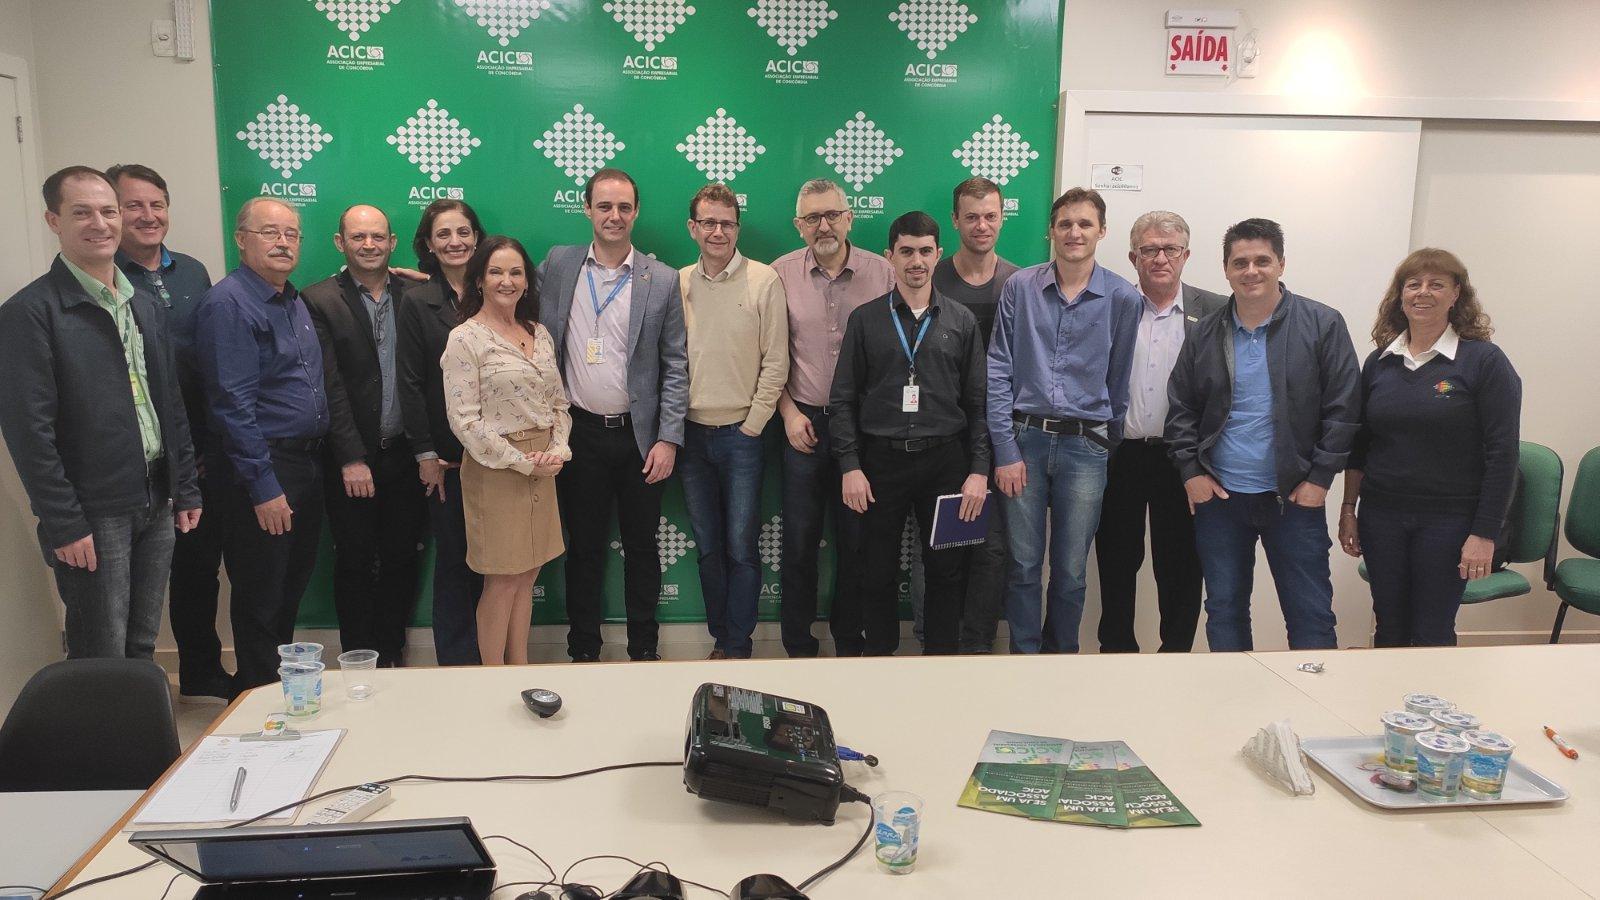 Celesc pretende investir R$ 100 milhões na área rural